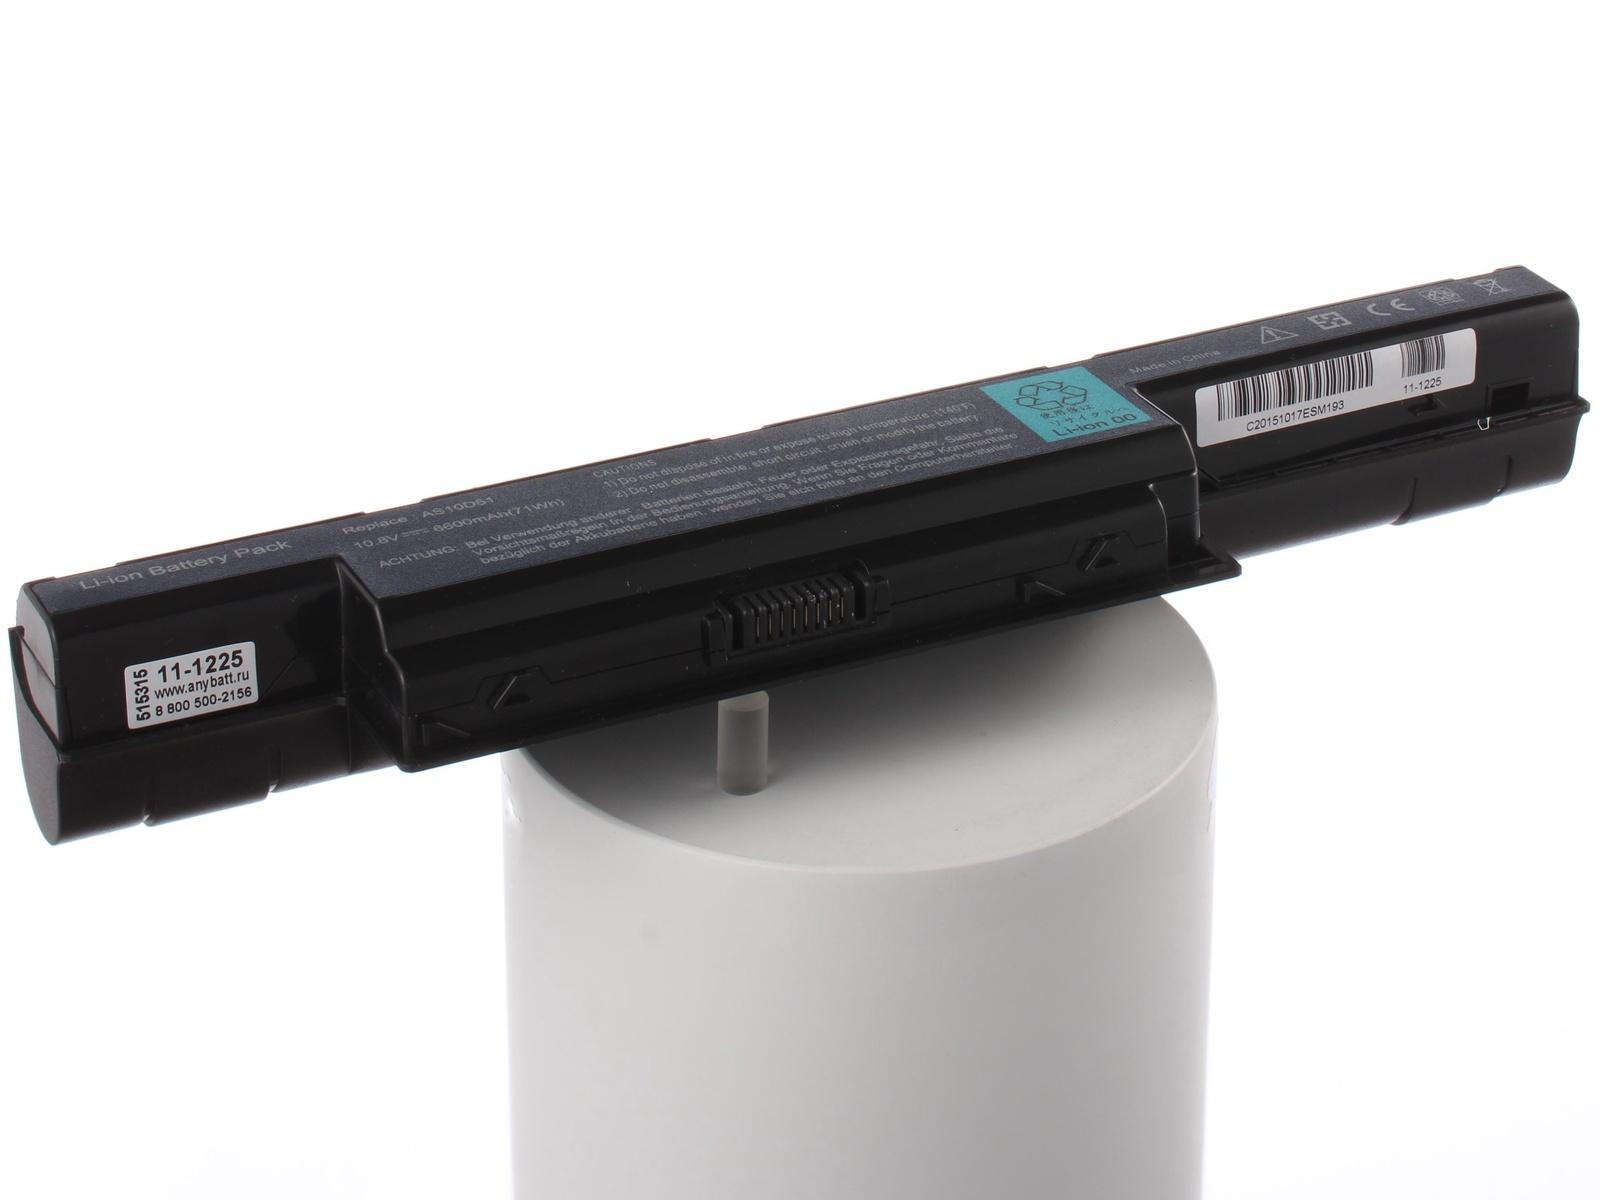 Аккумулятор для ноутбука AnyBatt для Acer TravelMate 8472T-383G32Mnkk, Travelmate 8572TG-383G50Mnkk, TravelMate P273-M-53236G75Mn, Travelmate P453-MG, для eMachines G530, E440, G730, E730, E642G, E732G, D440, E732ZG, E732, E640G аккумулятор для ноутбука anybatt для acer emachines e732 382g32mikk emachines e732g 332g25mikk emachines g730zg p622g32miks travelmate 5735 travelmate 5742zg travelmate 8472t travelmate p273 m aspire 4738z